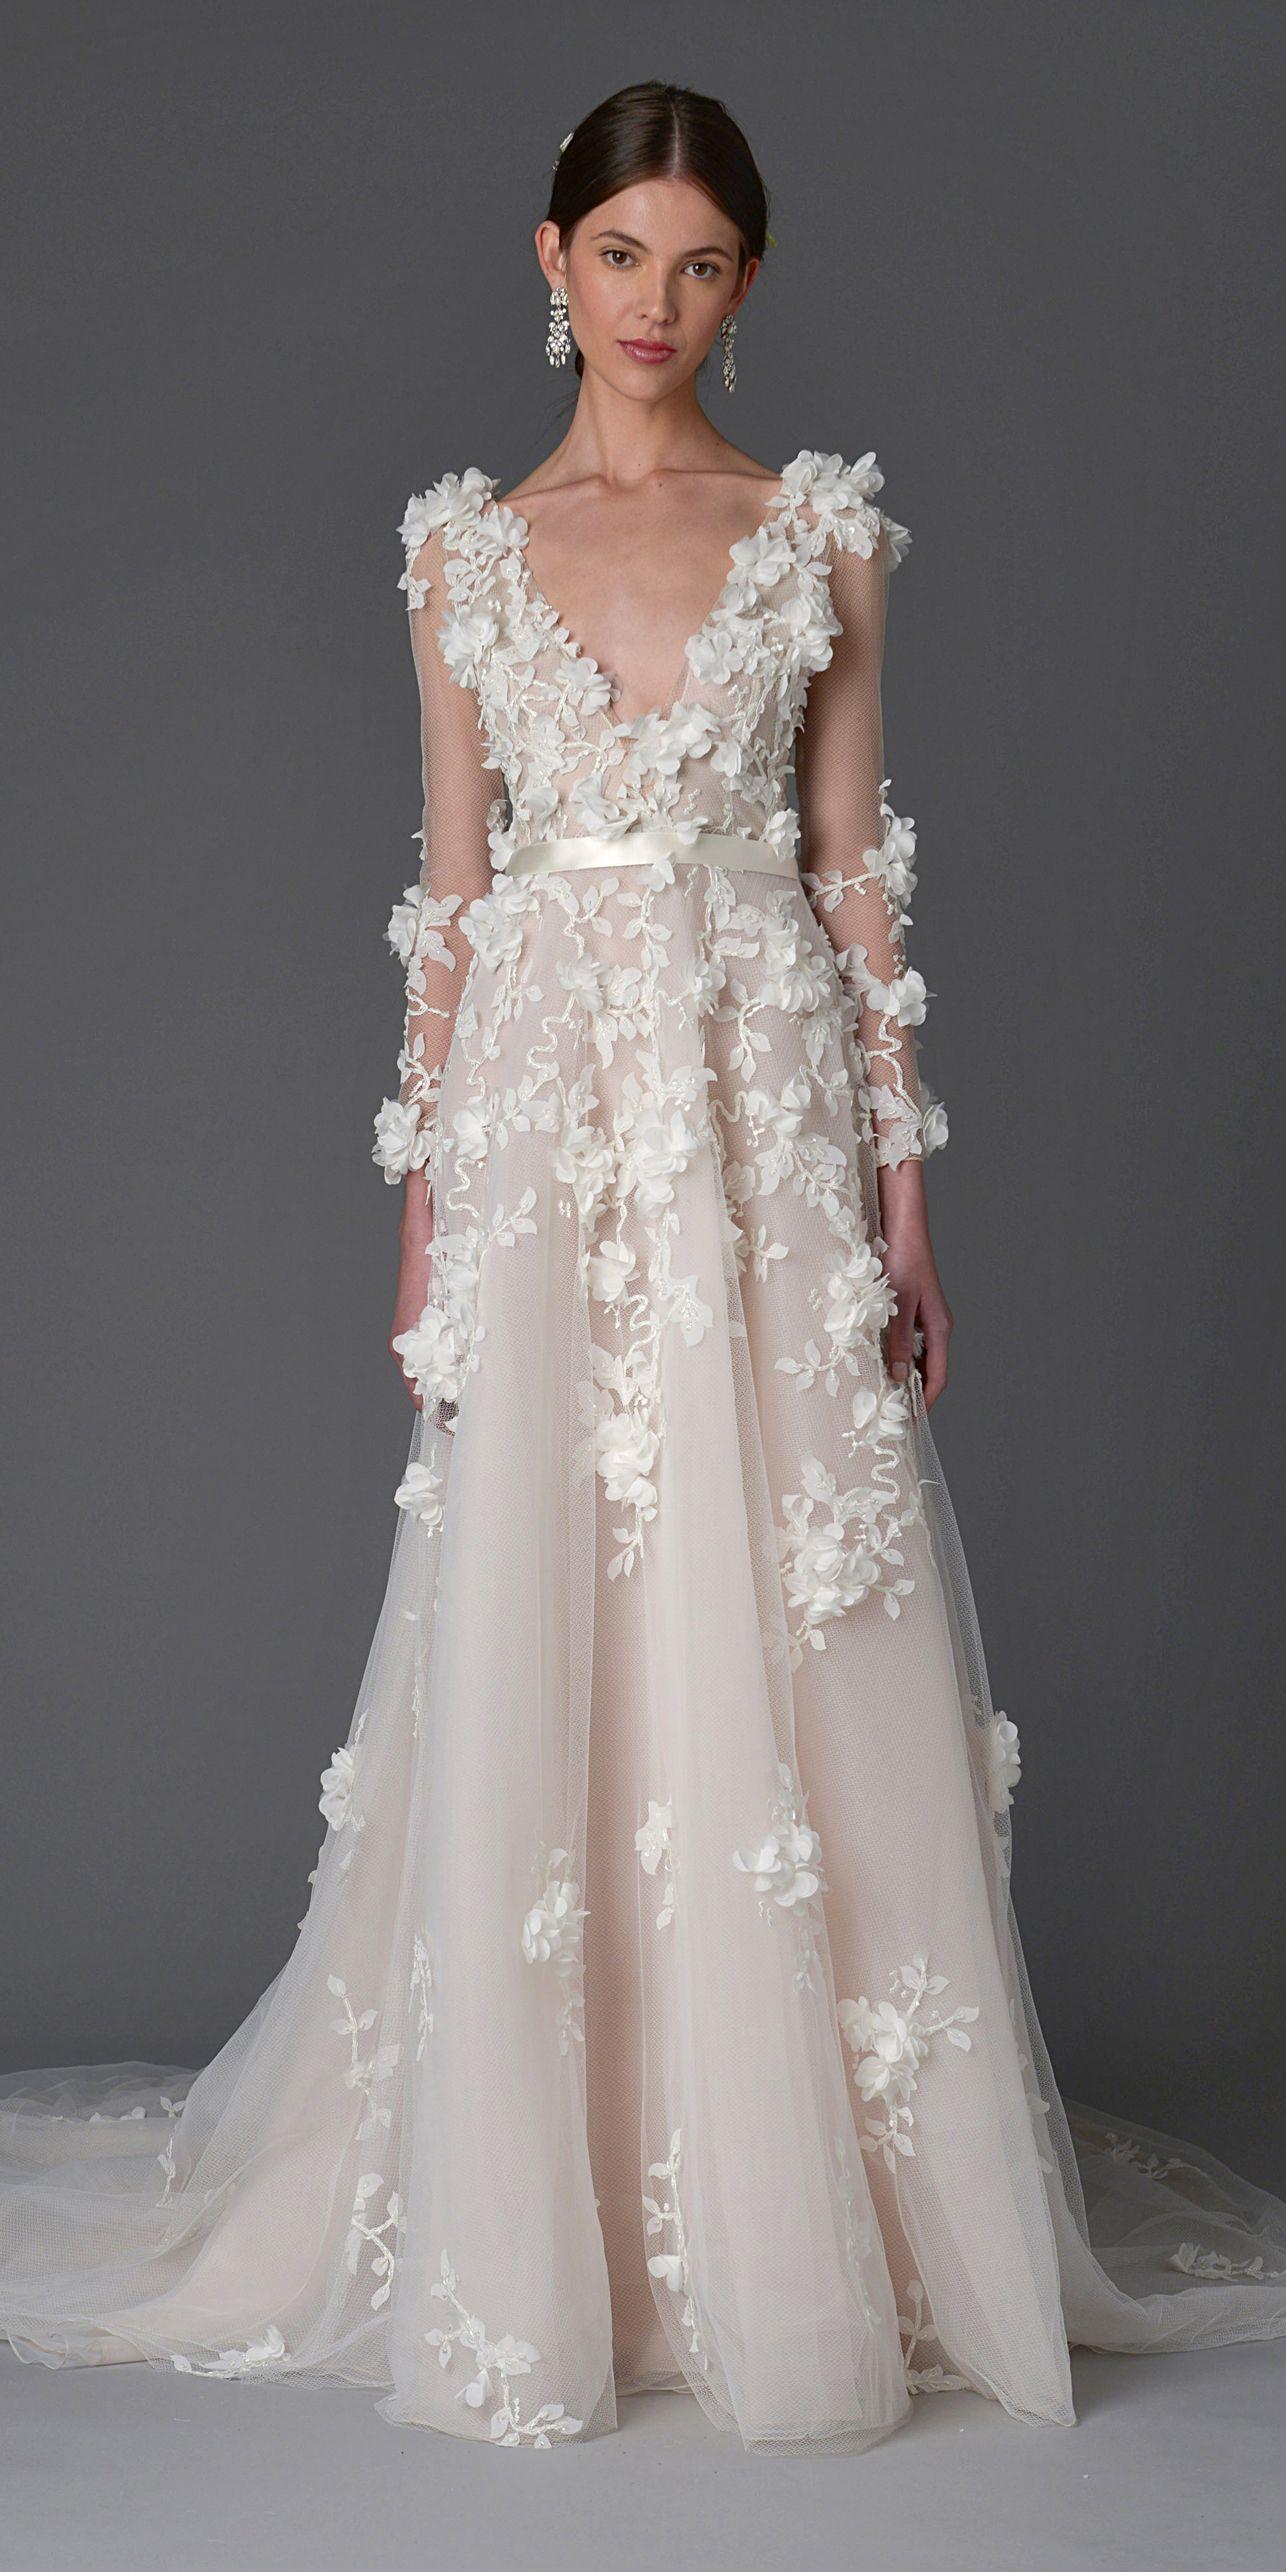 The prettiest spring wedding dresses from bridal fashion week